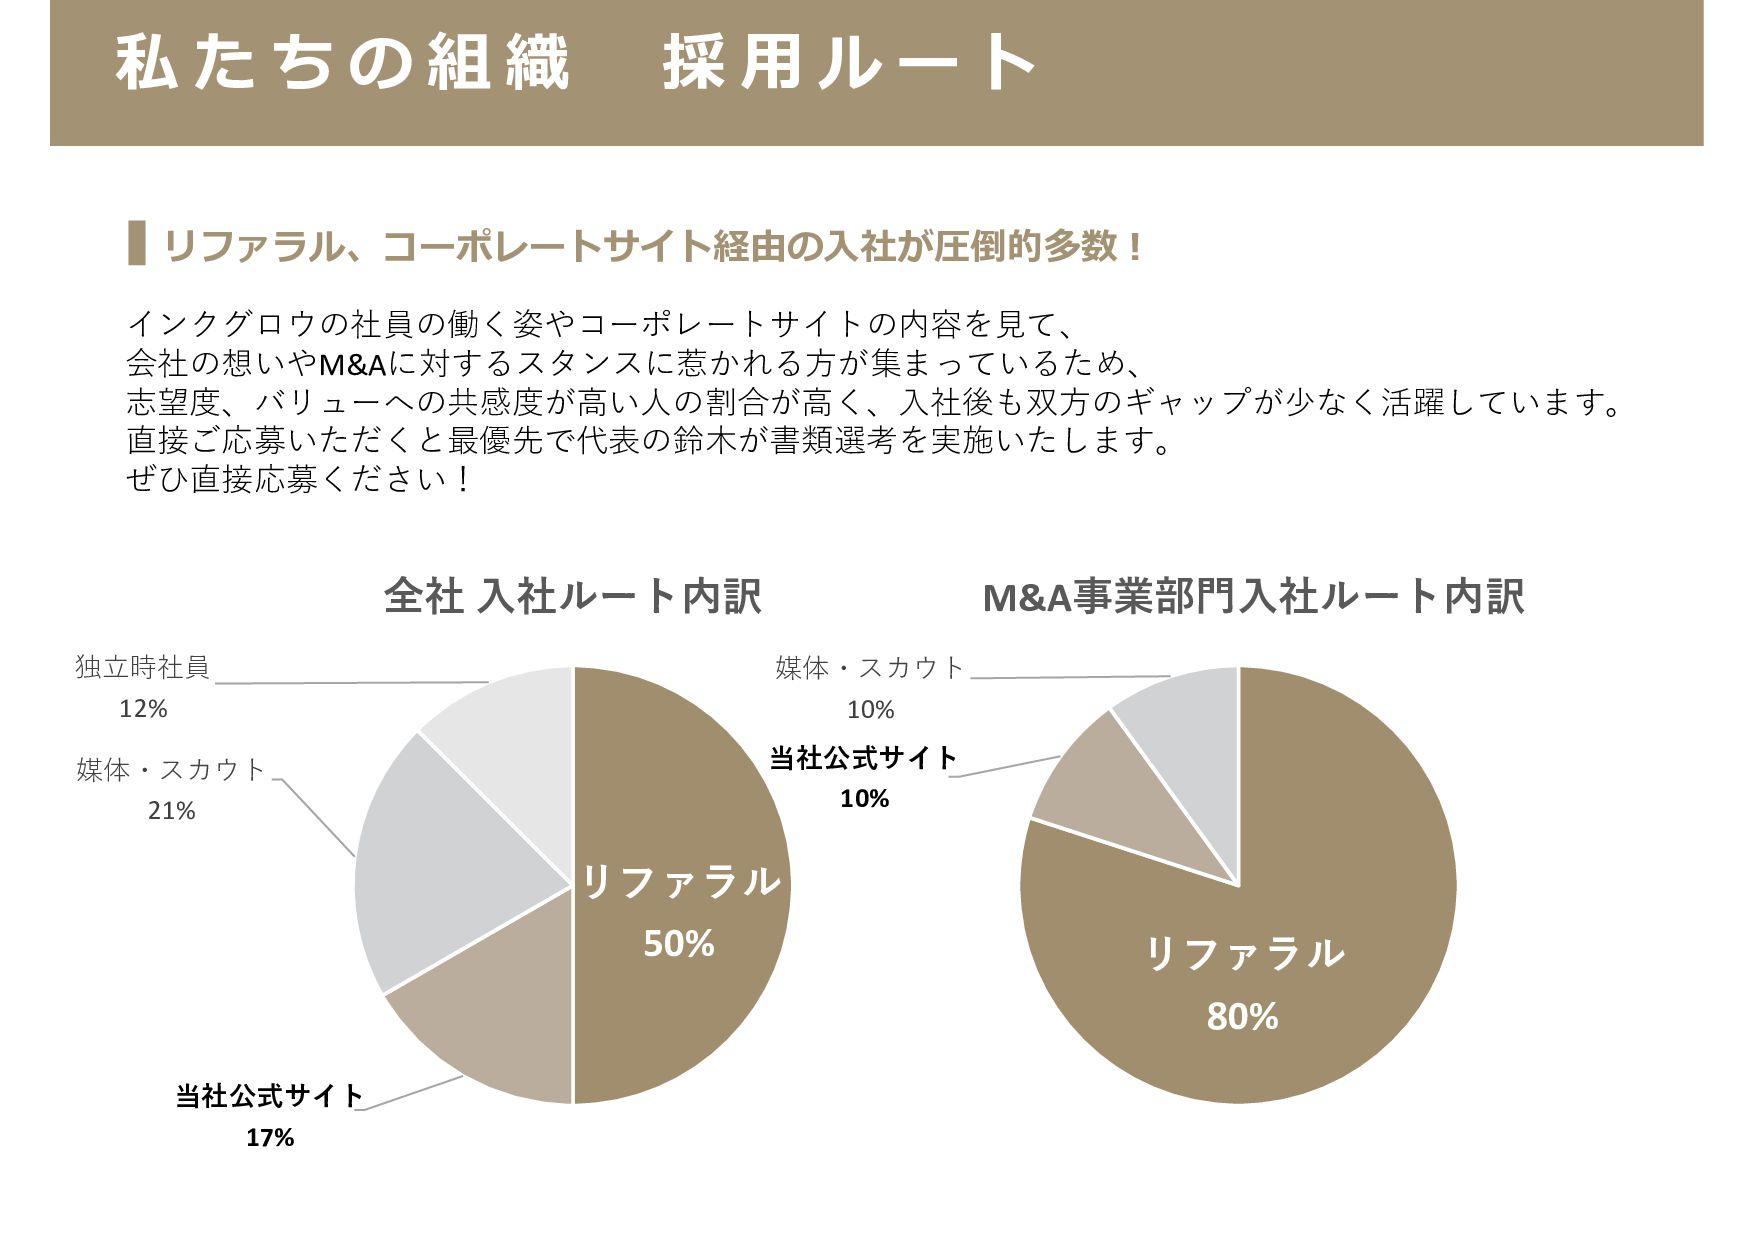 第 三 者 承 継 支 援 ( M & A 仲 介 事 業 ) M&Aの仲介事業を展開する会社...